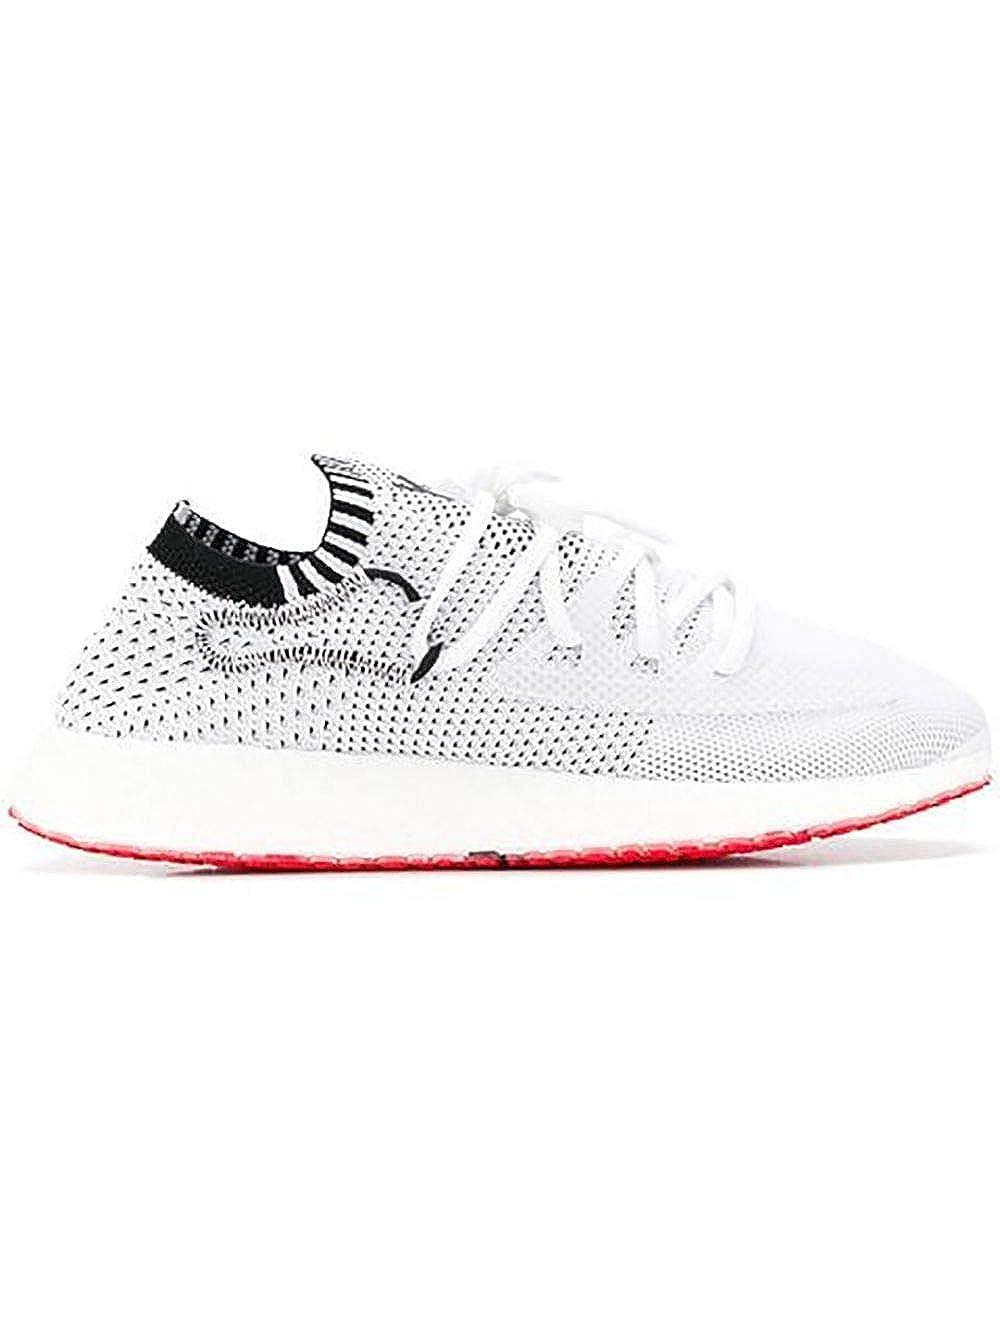 adidas Y 3 Yohji Yamamoto Herren F97405 Weiss Stoff Sneakers